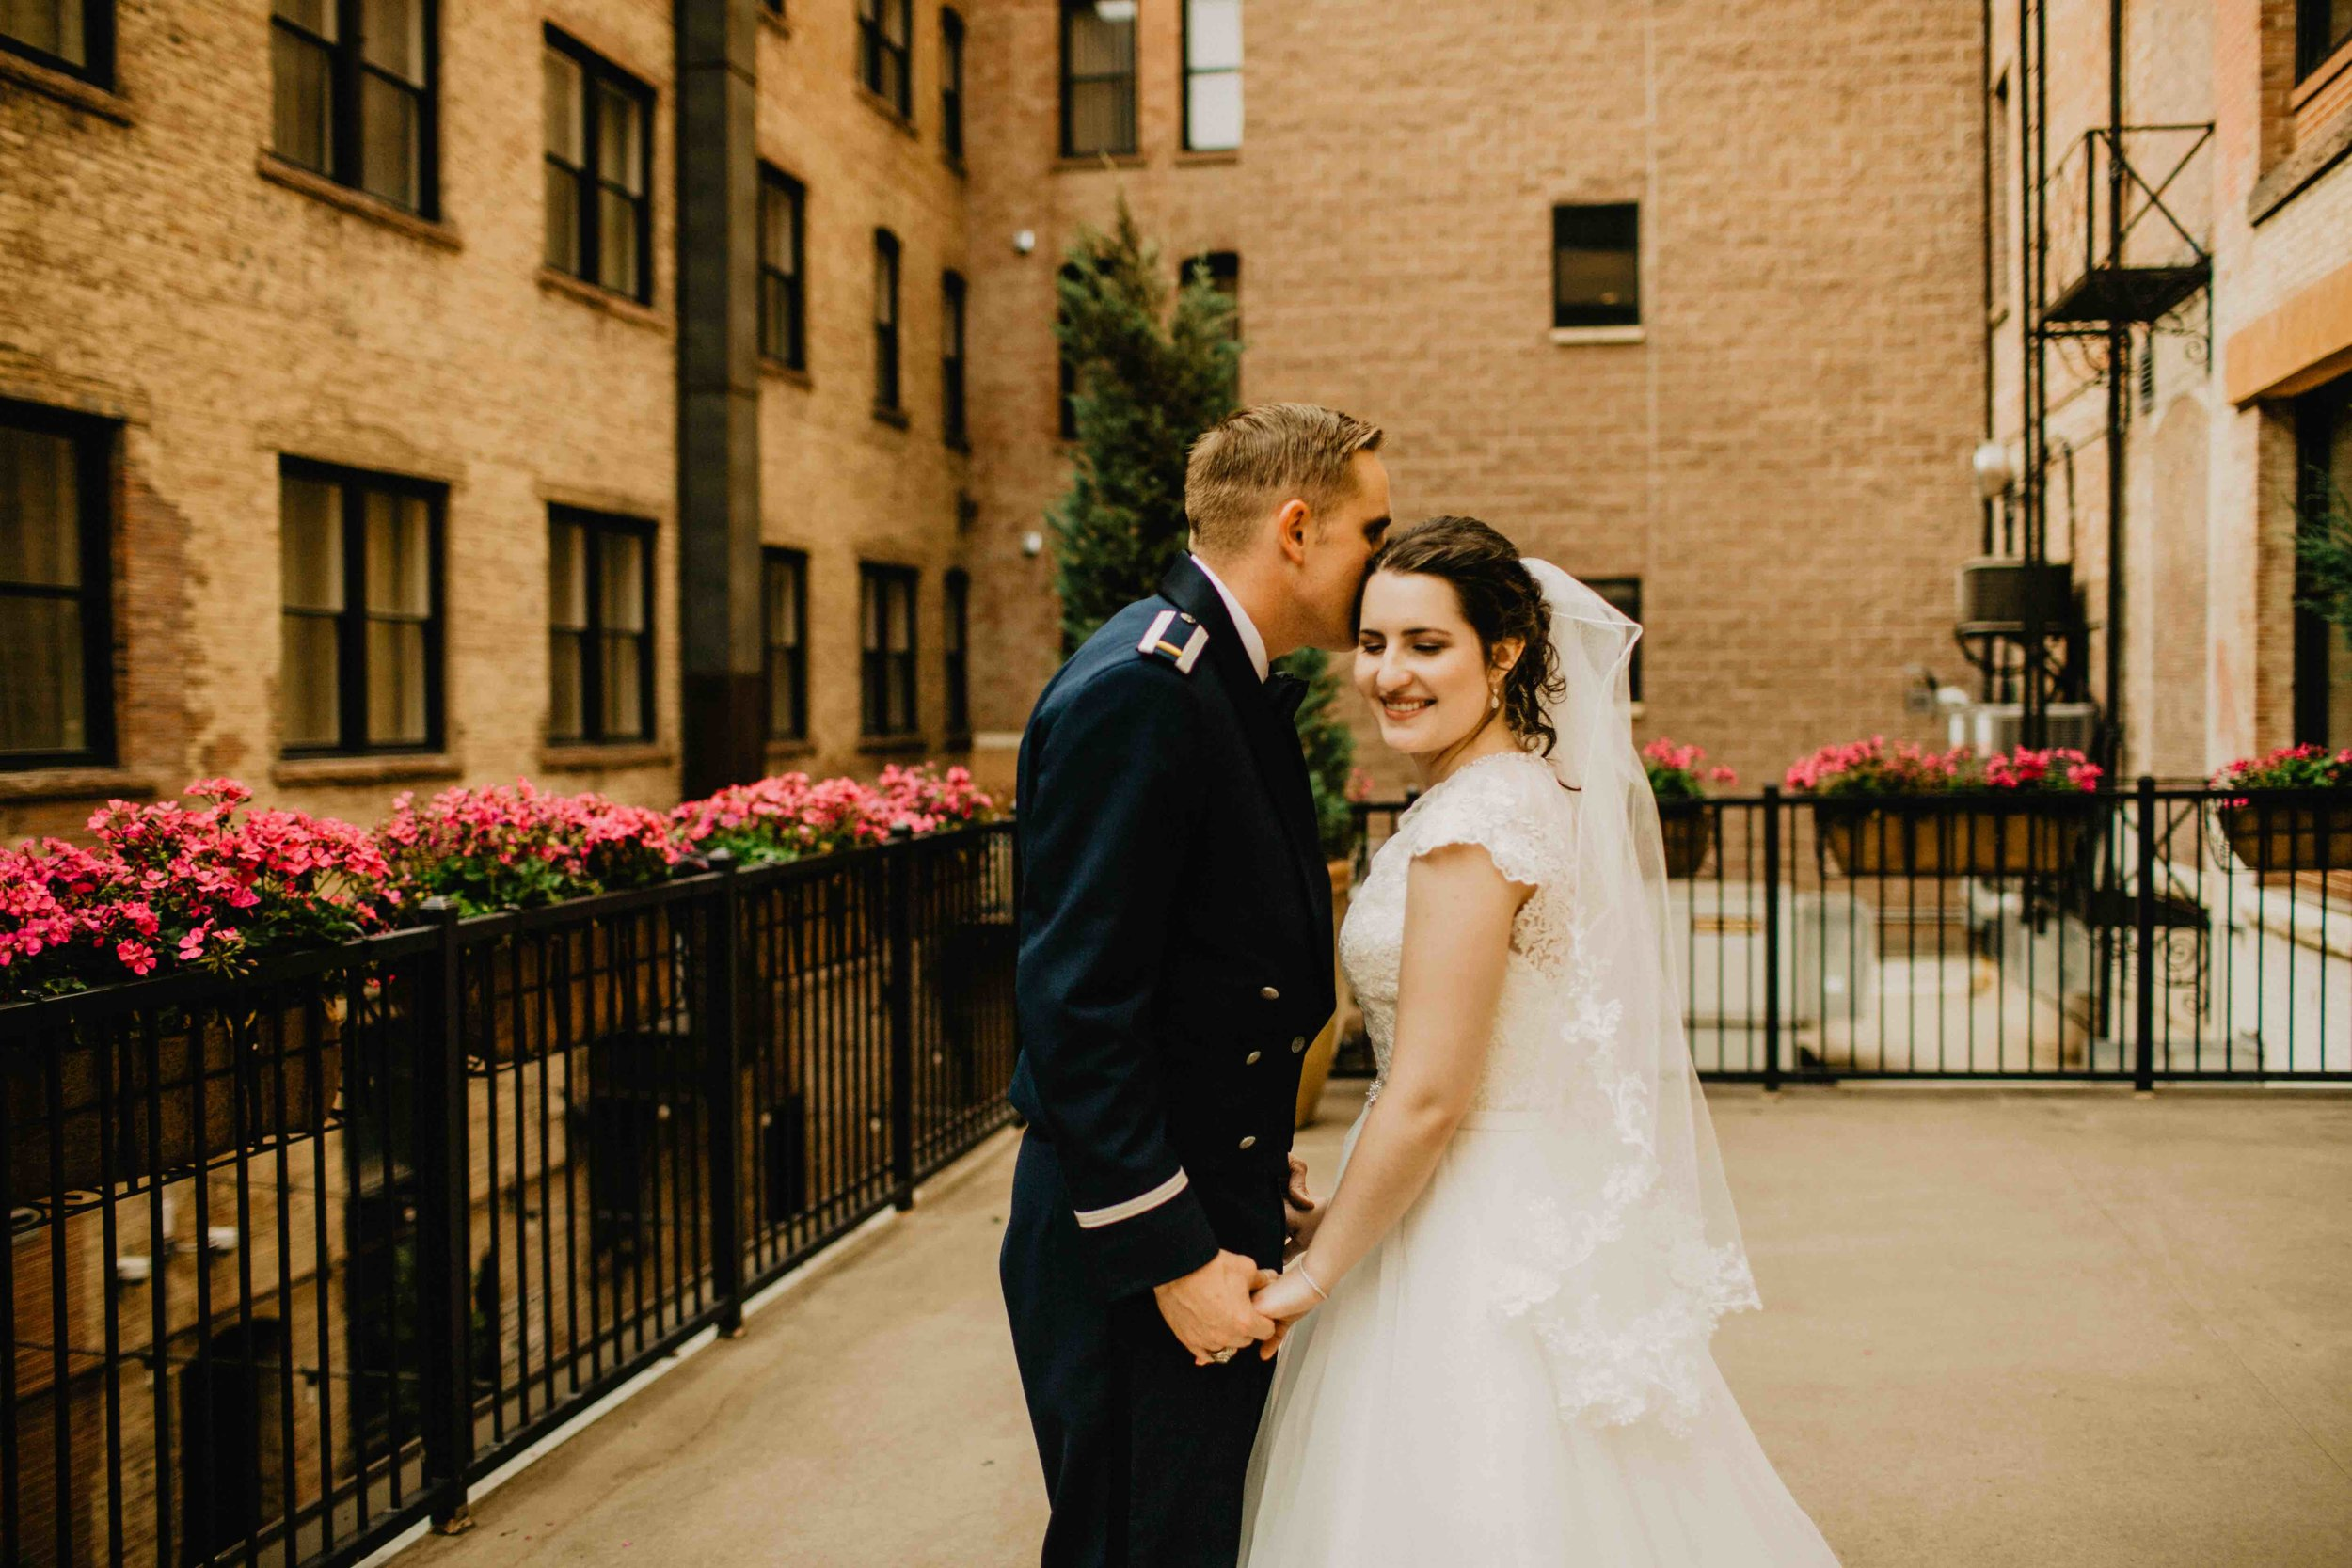 607A6077-colorado-wedding-photographer-denver-springs-vail--colorado-wedding-photographer-denver-springs-vail-.jpeg